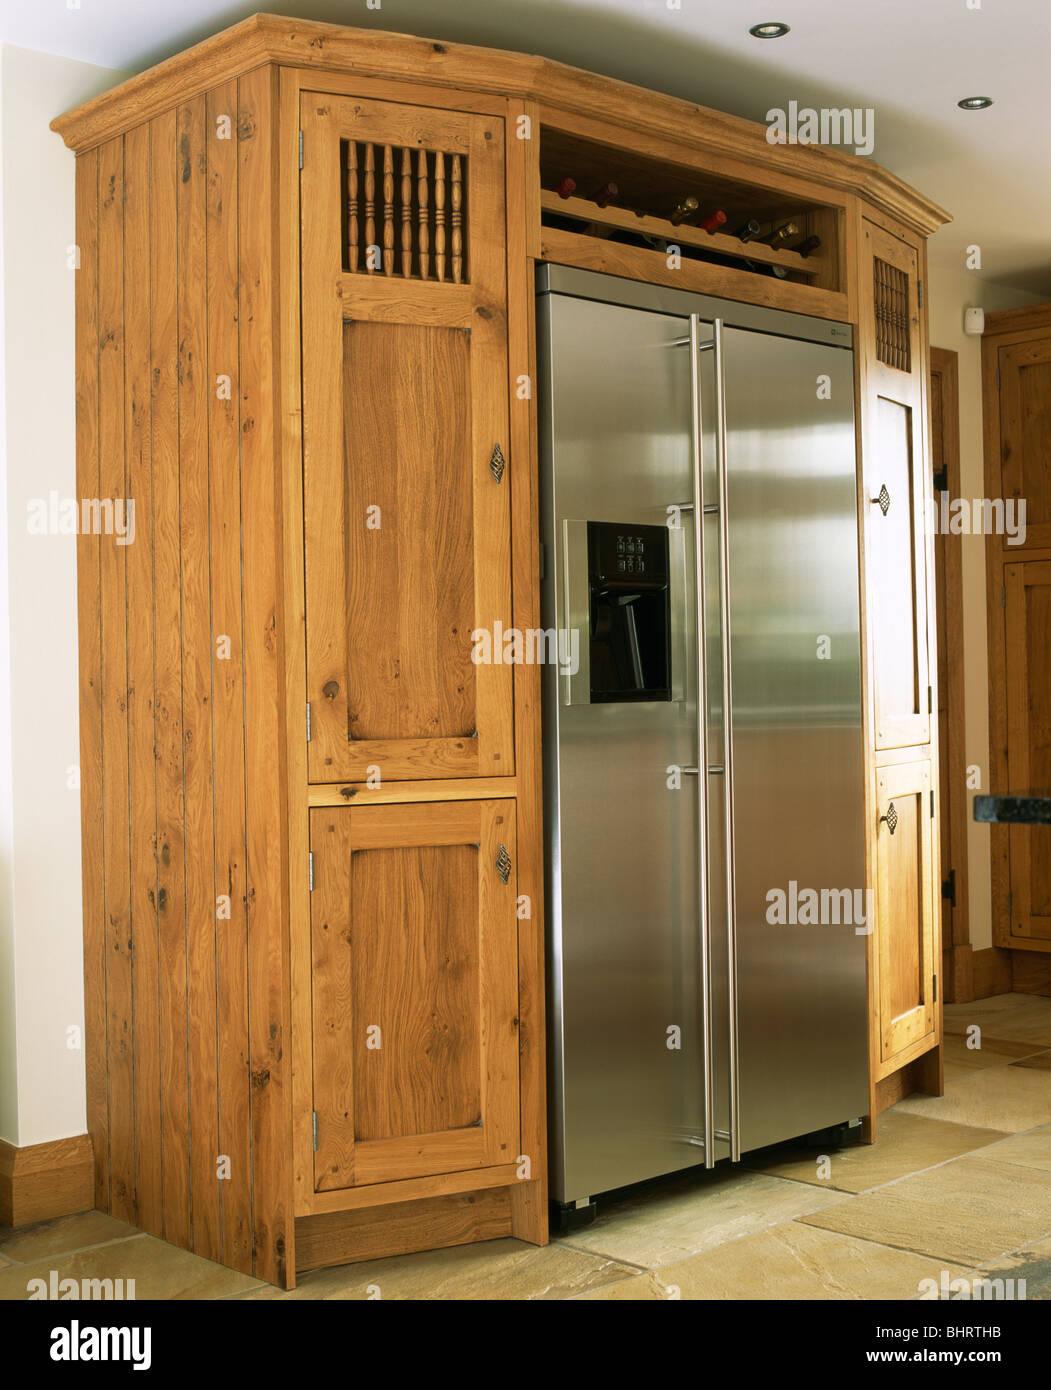 large stainless steel american style fridge freezer built. Black Bedroom Furniture Sets. Home Design Ideas